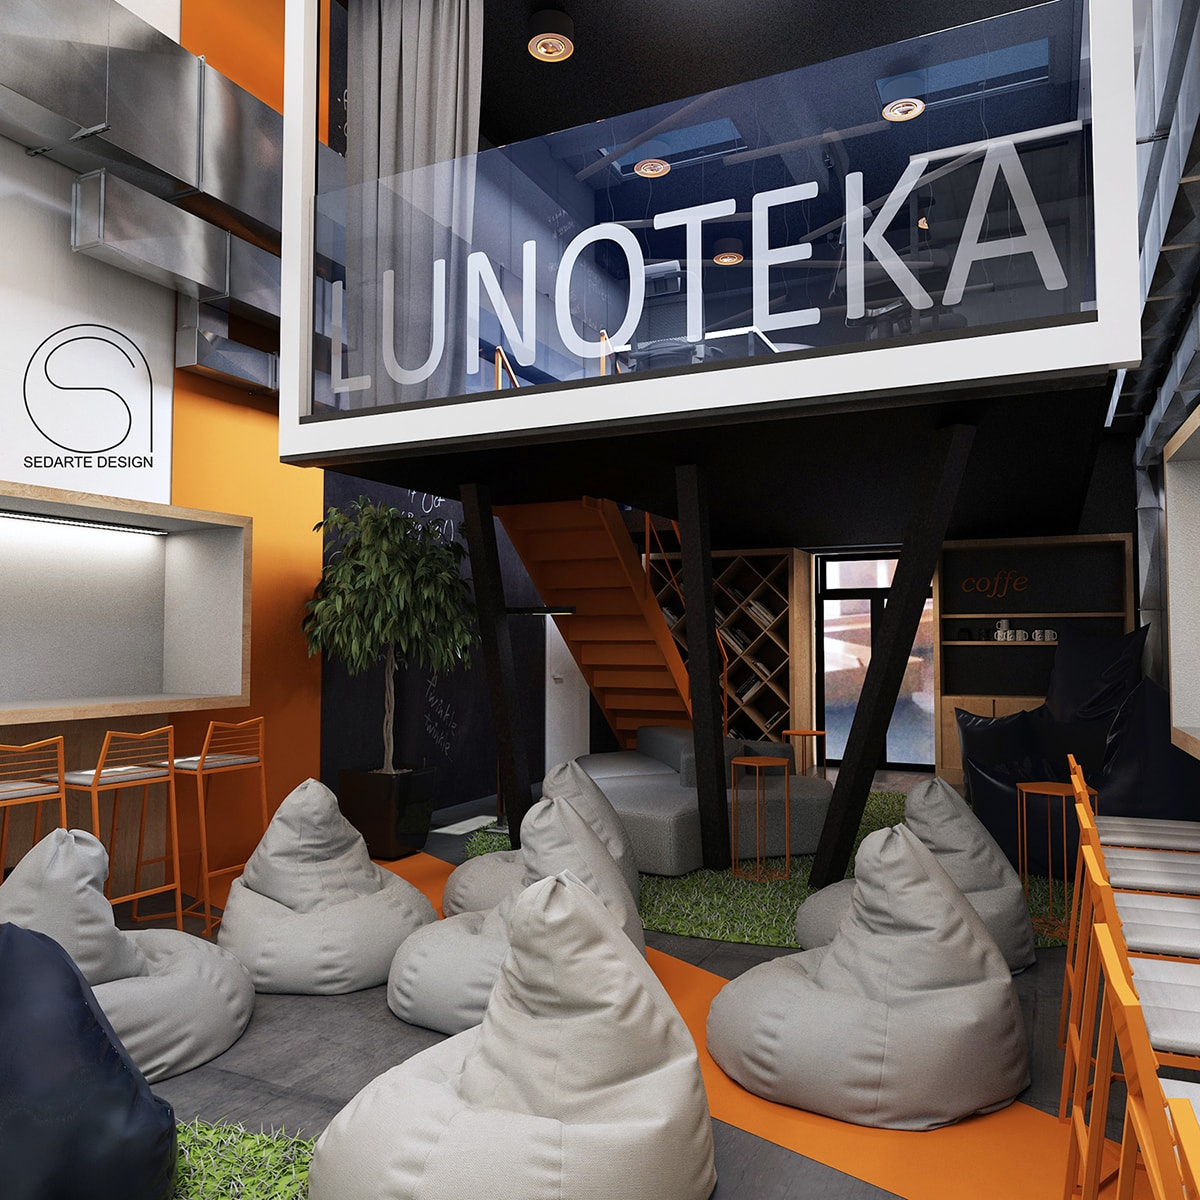 LUNOTEKA, г. Киев